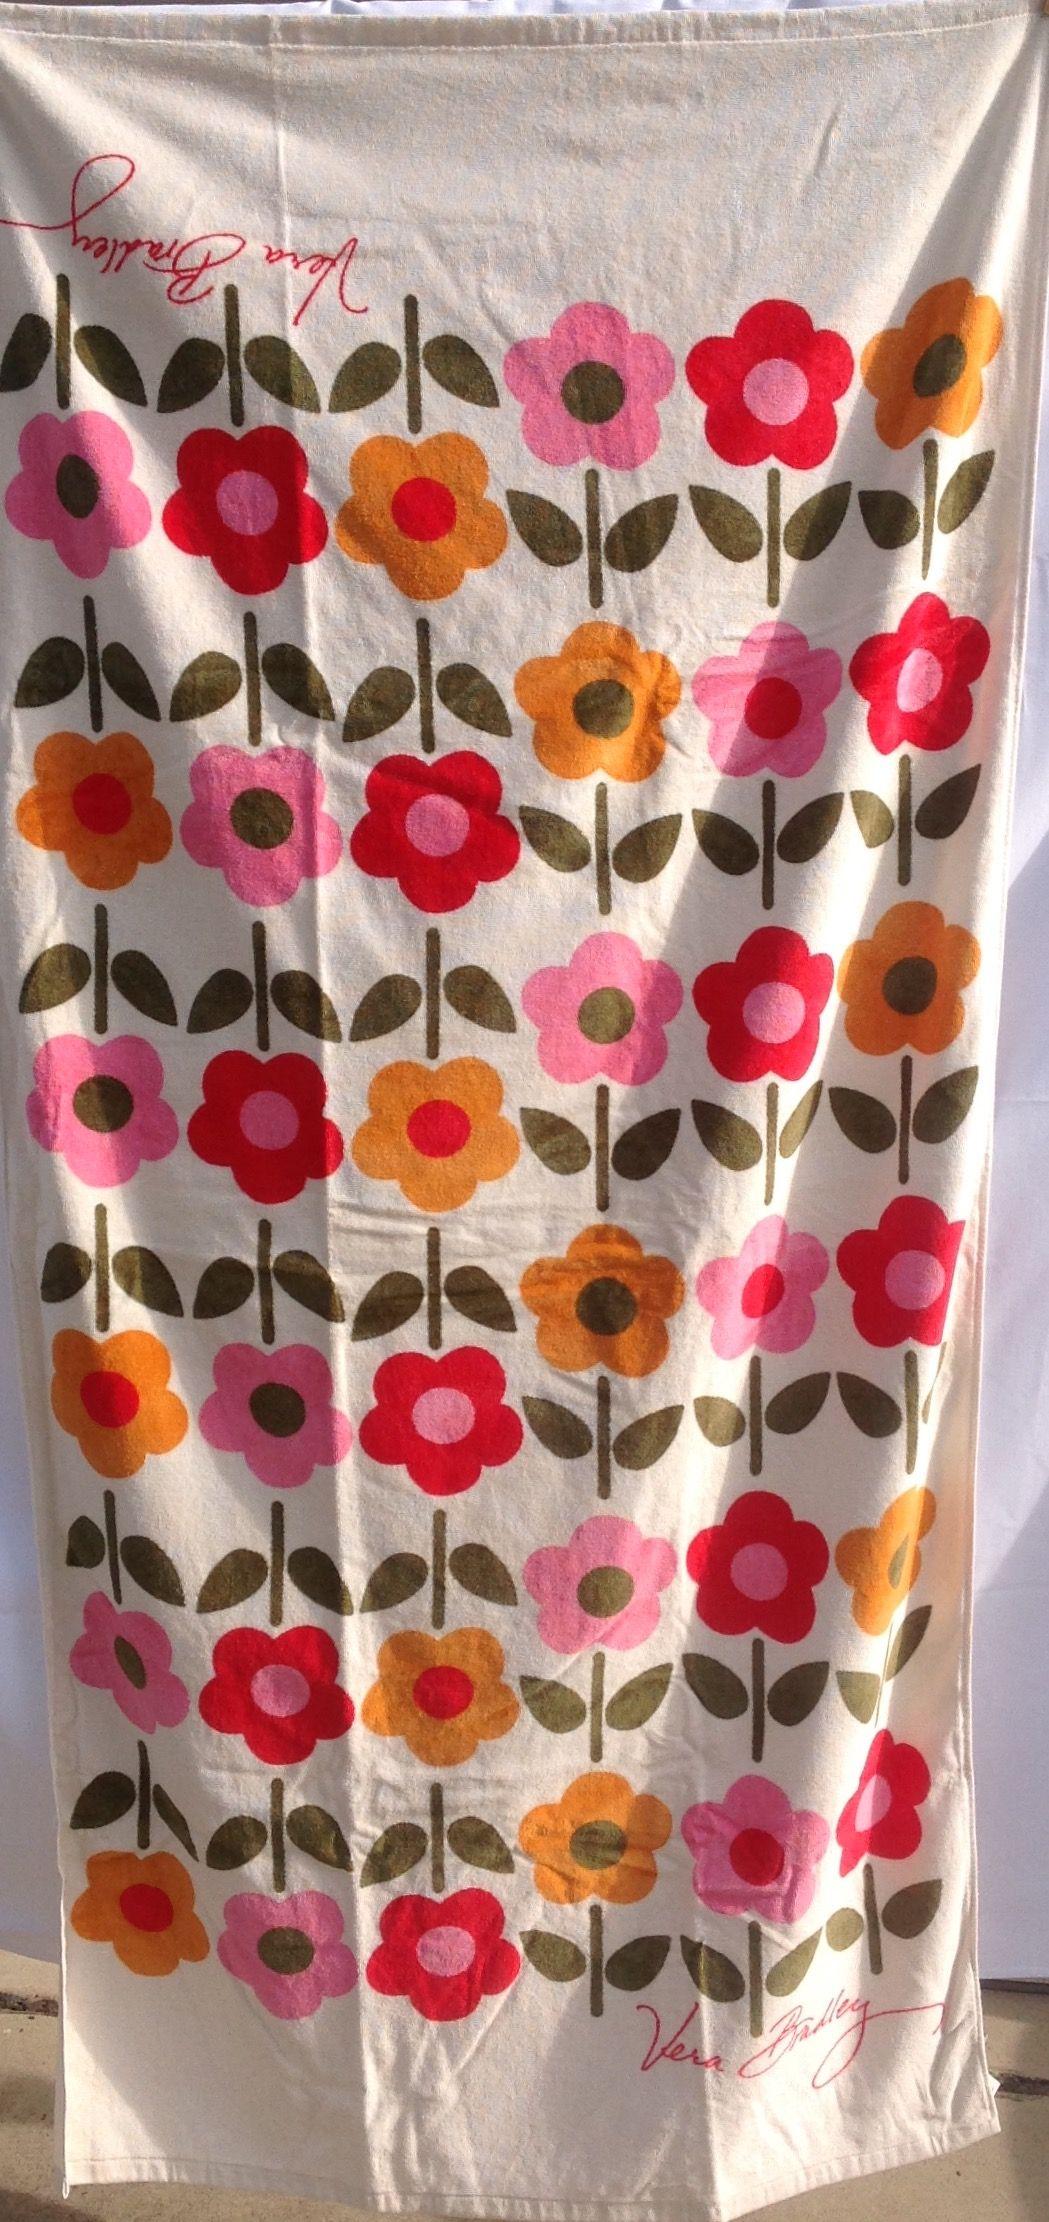 Vera bradley shower curtain - Vera Bradley Folkloric Beach Towel Set On Ebay Very 60 S